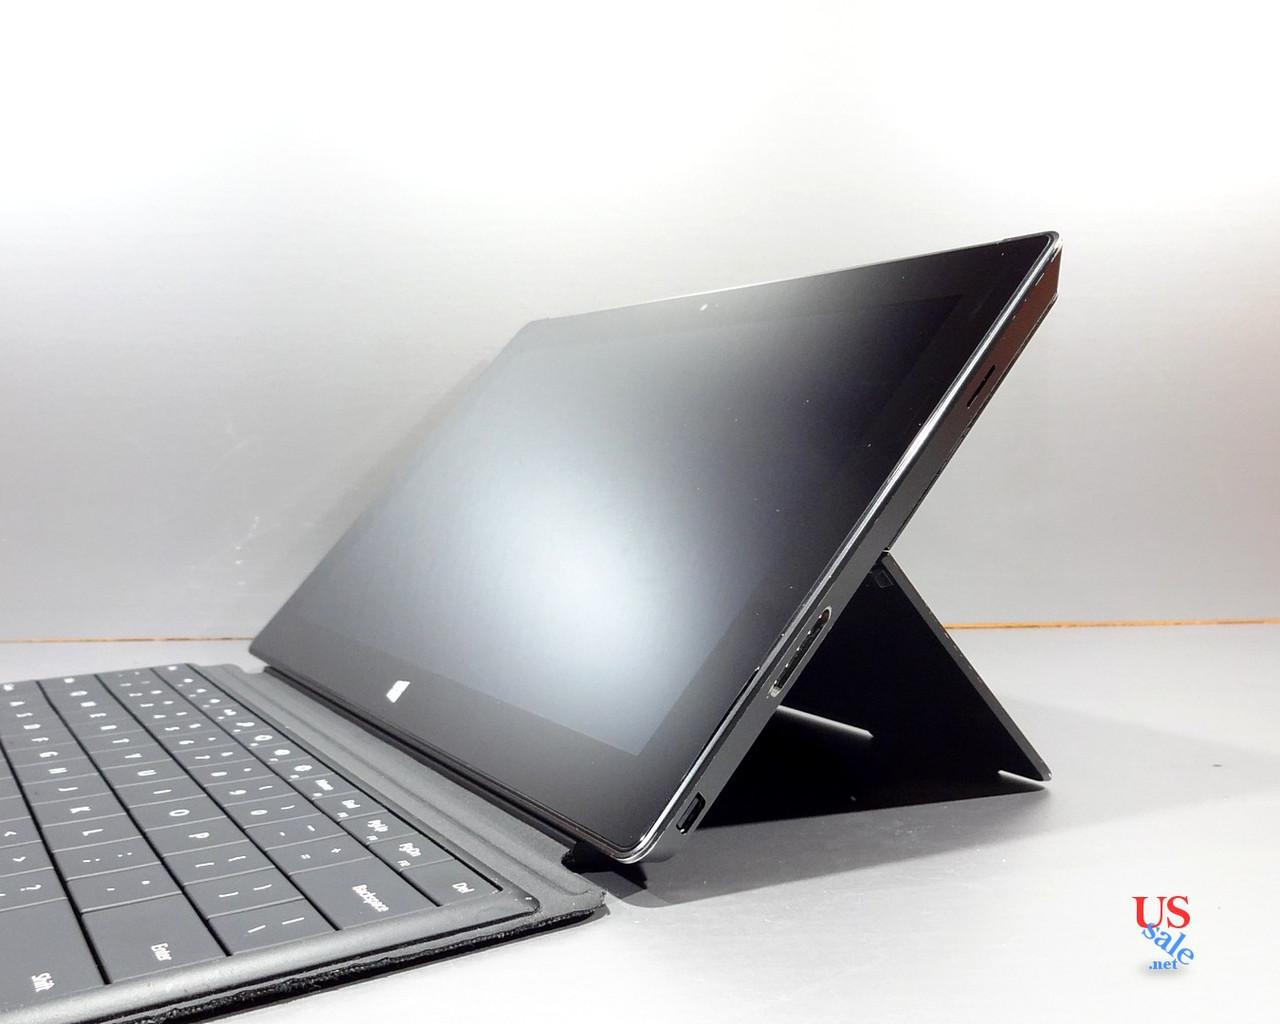 Ноутбук Microsoft Surface Pro 2 10.6″ IPS, i5-4200u 1.6Ghz, 4Gb DDR3, 128Gb SSD. Гарантия!